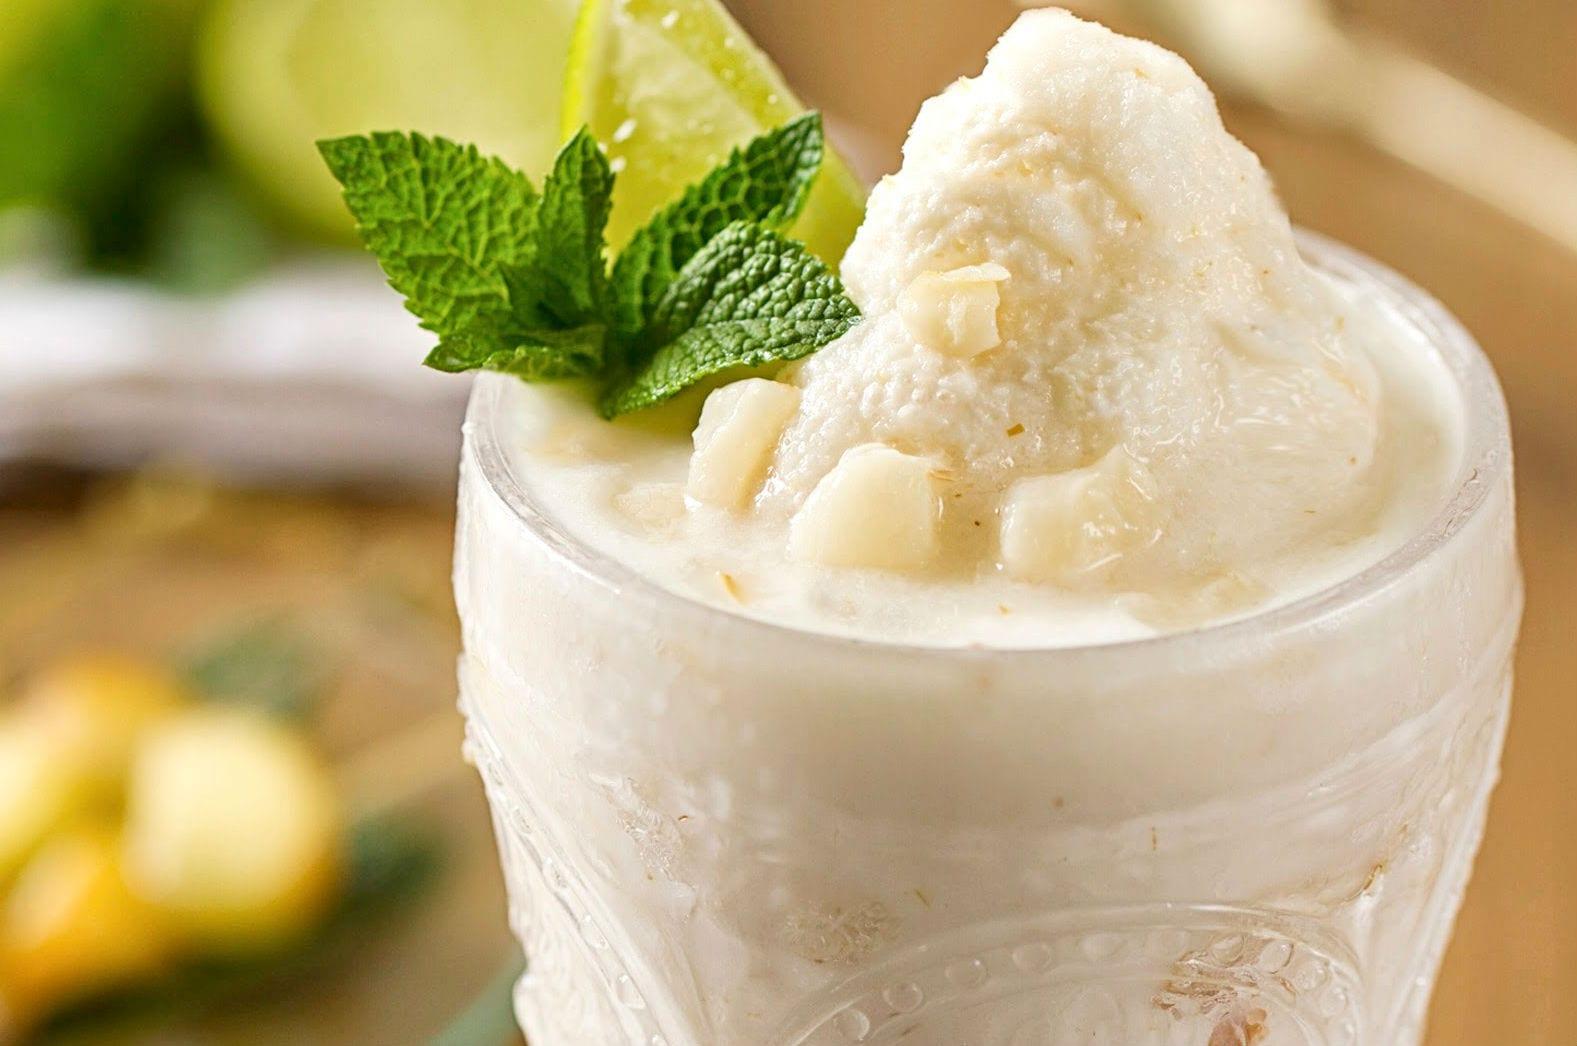 batido con leche de coco